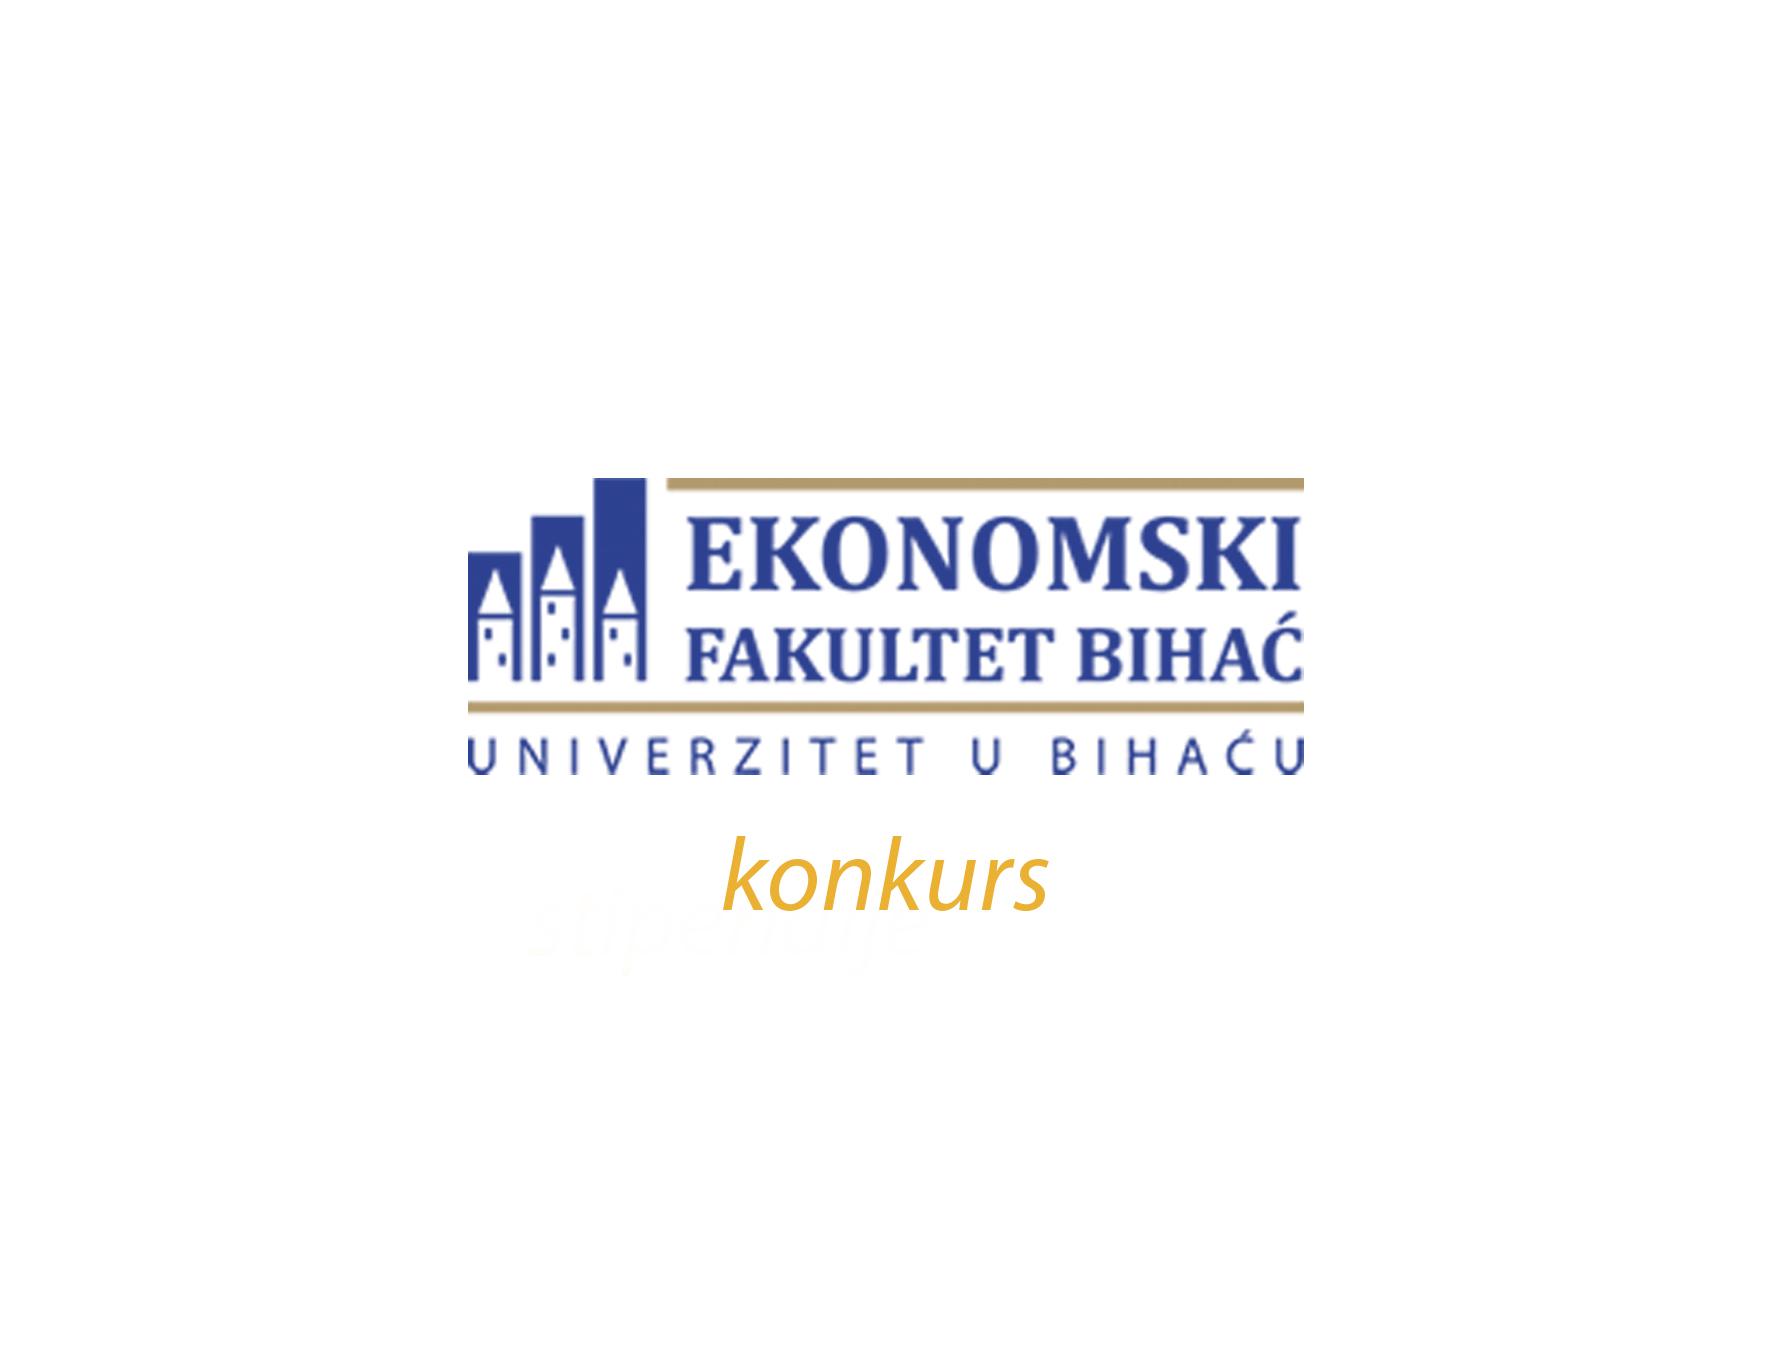 Konkurs Ekonomskog fakulteta Univerziteta u Bihaću